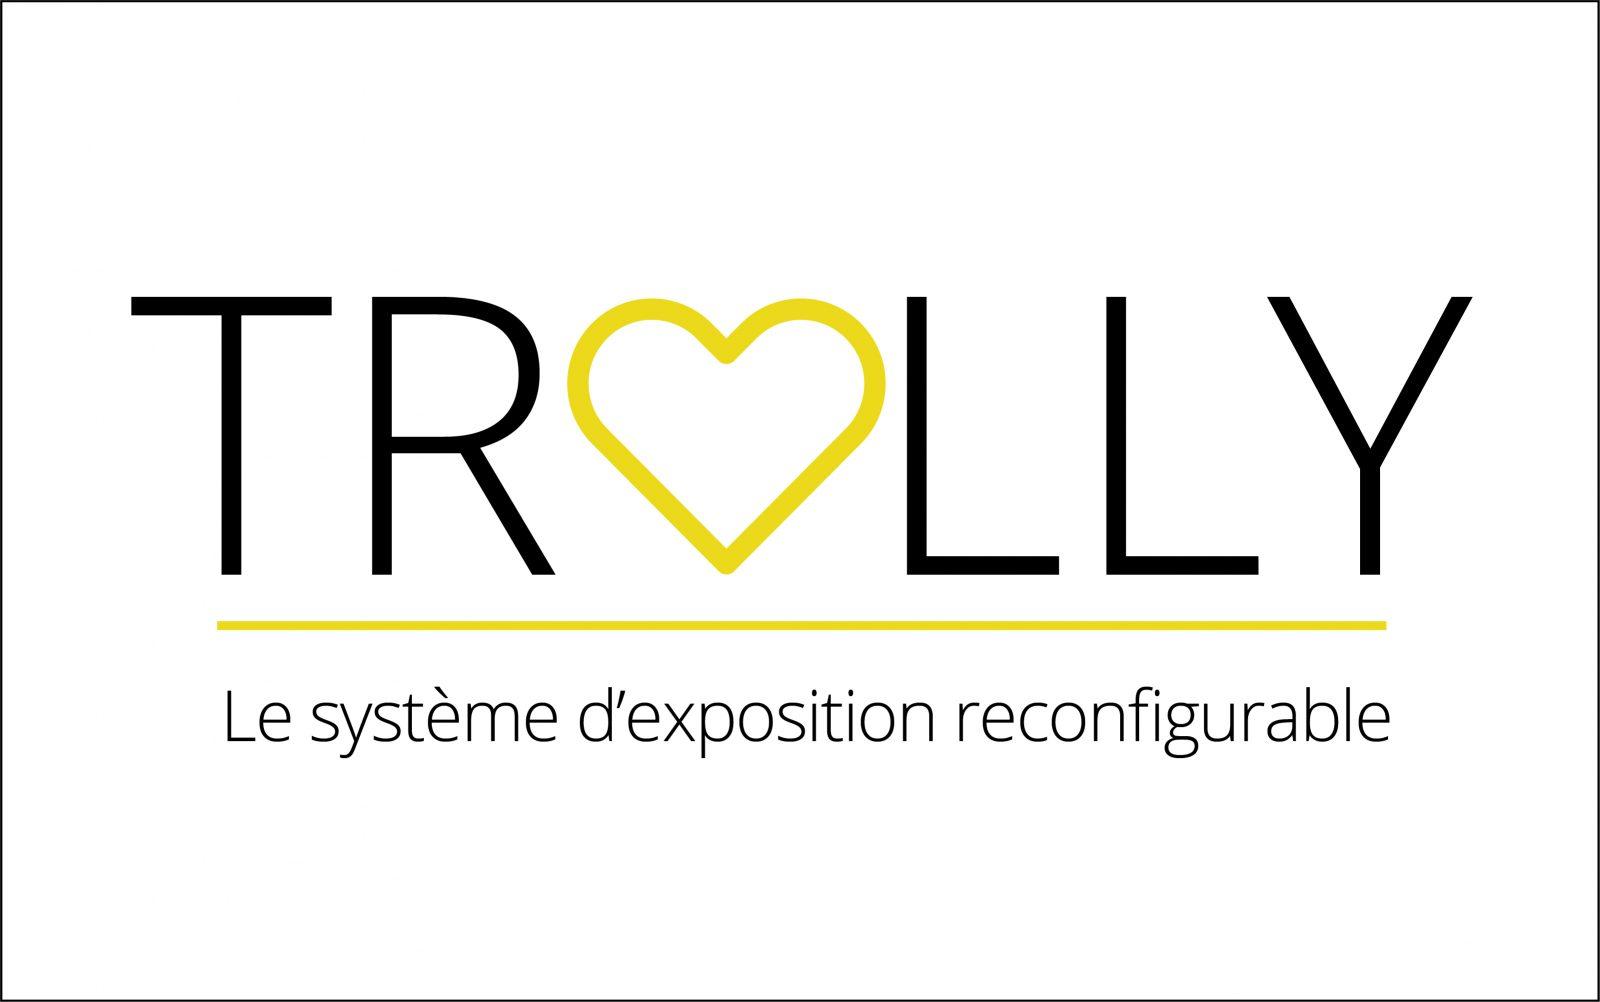 #Tools | Trolly